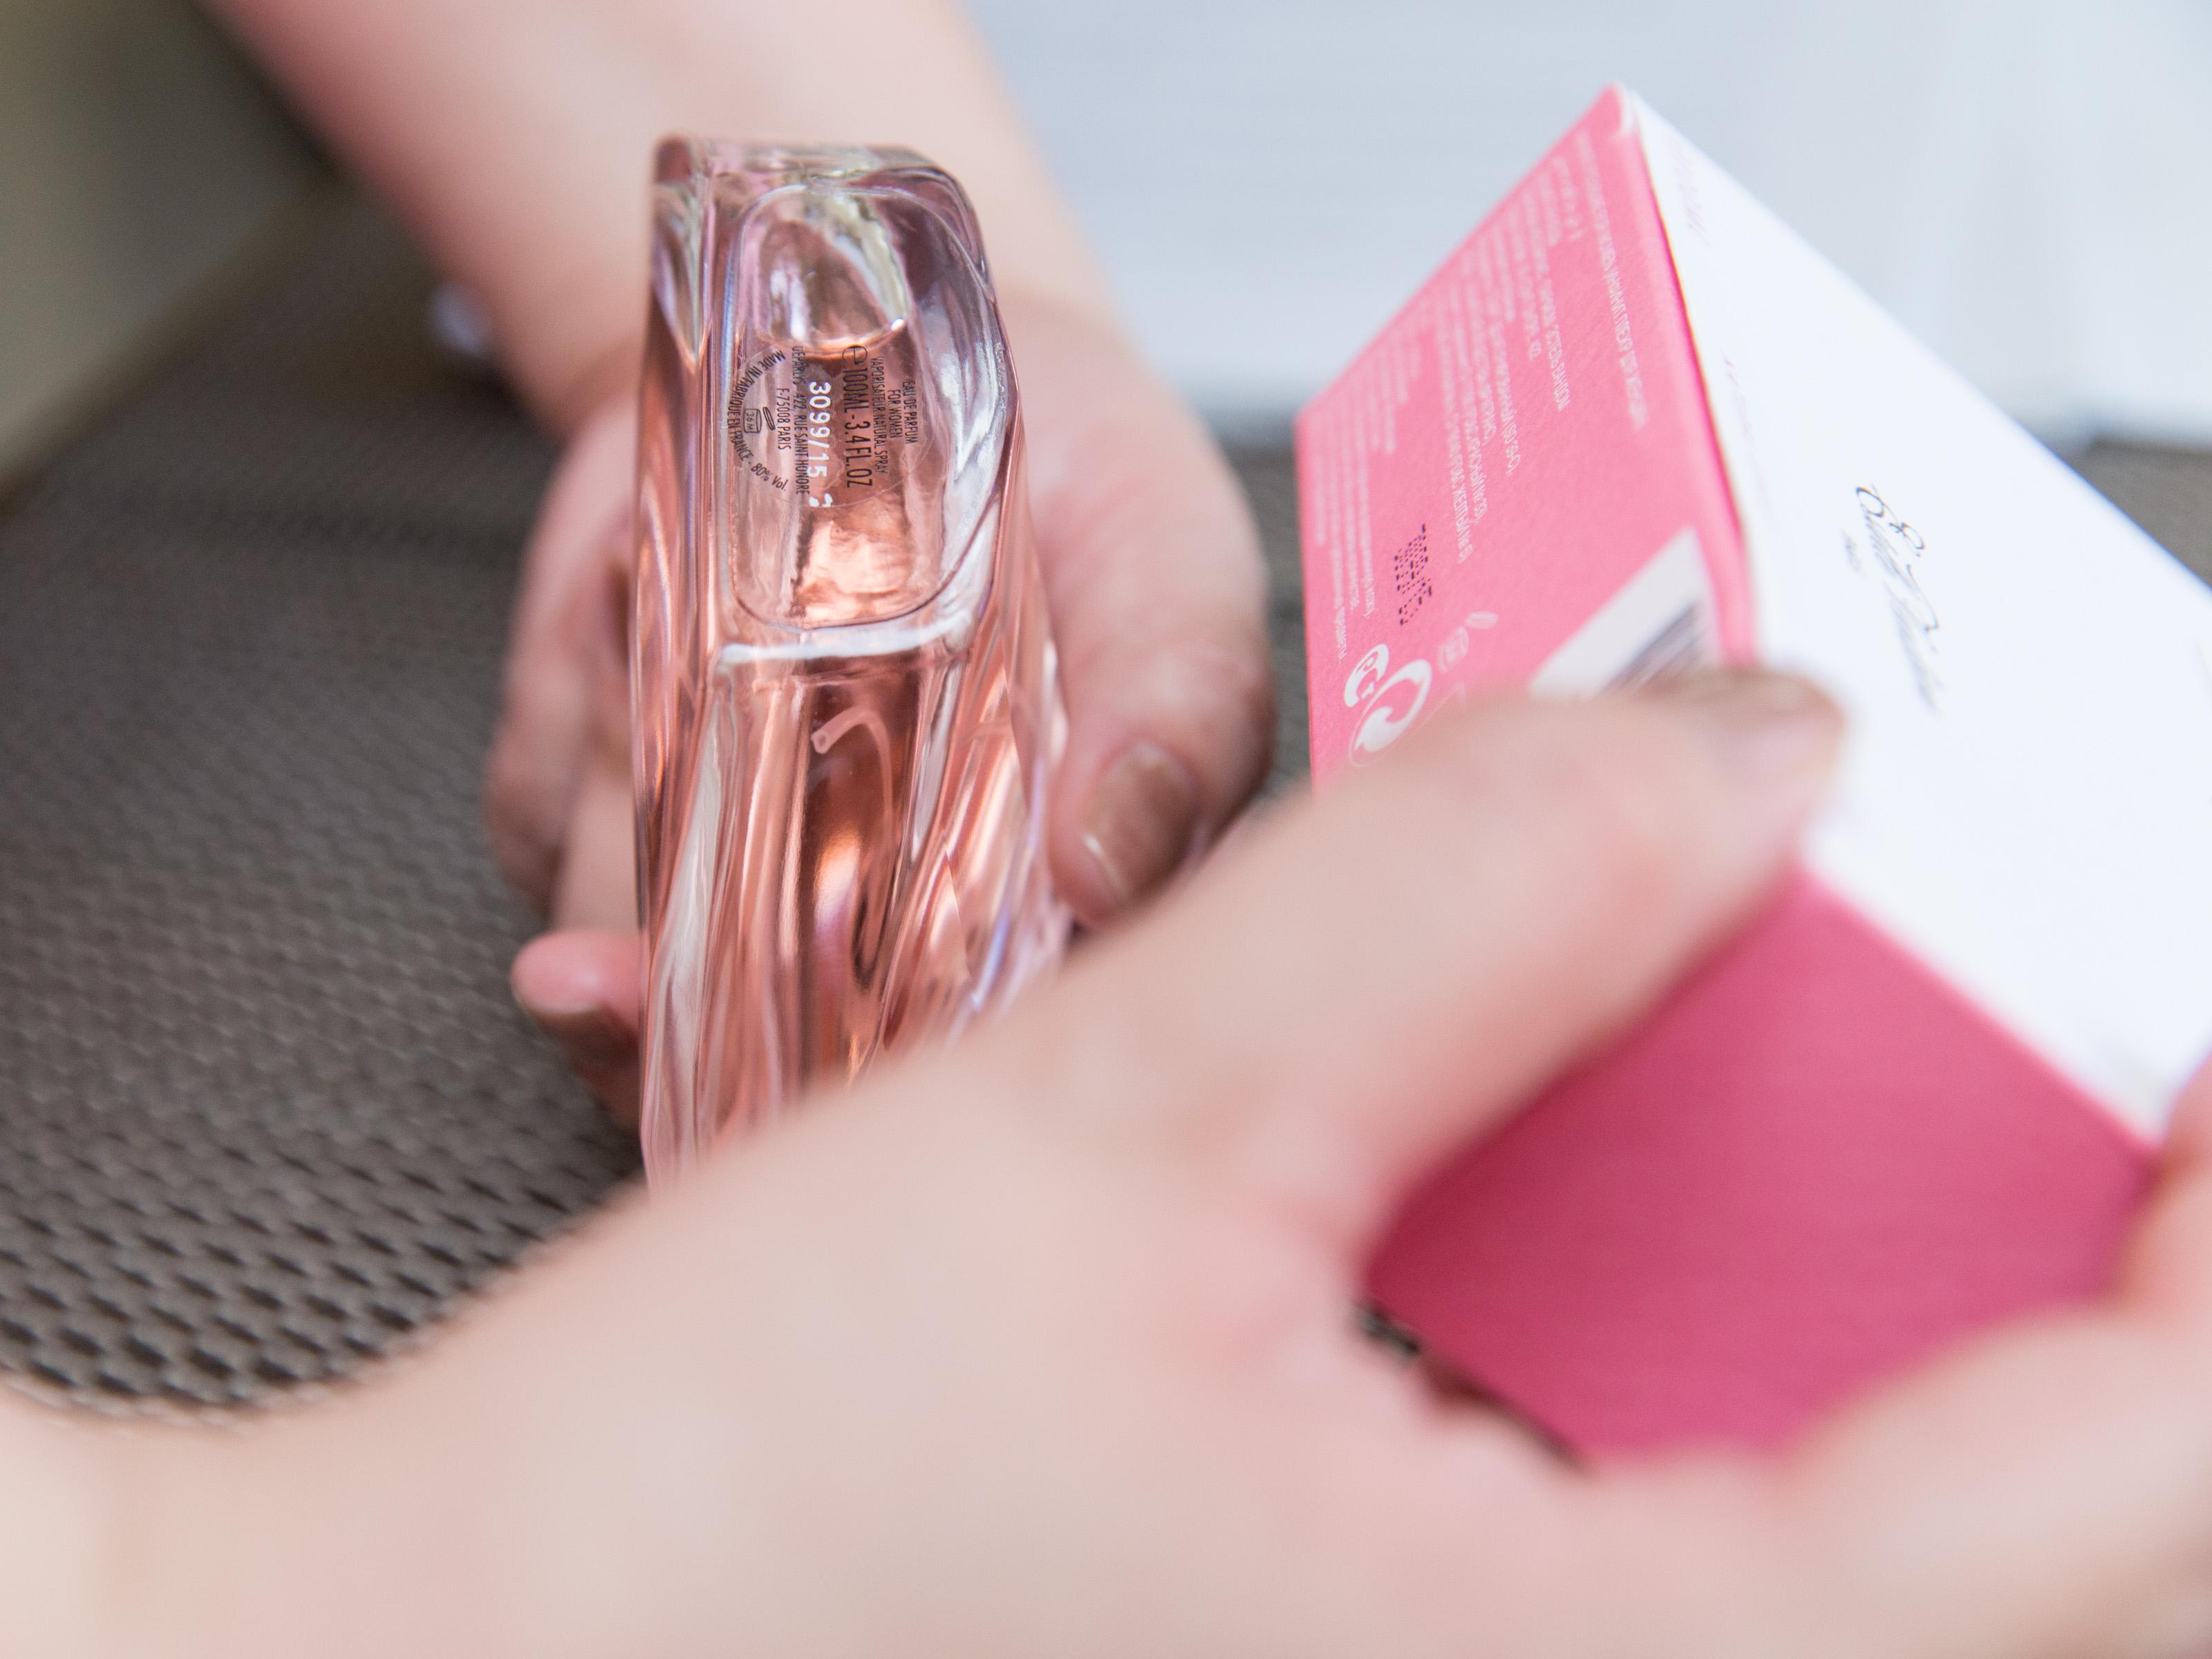 Apply-Perfume-Step-24.jpg